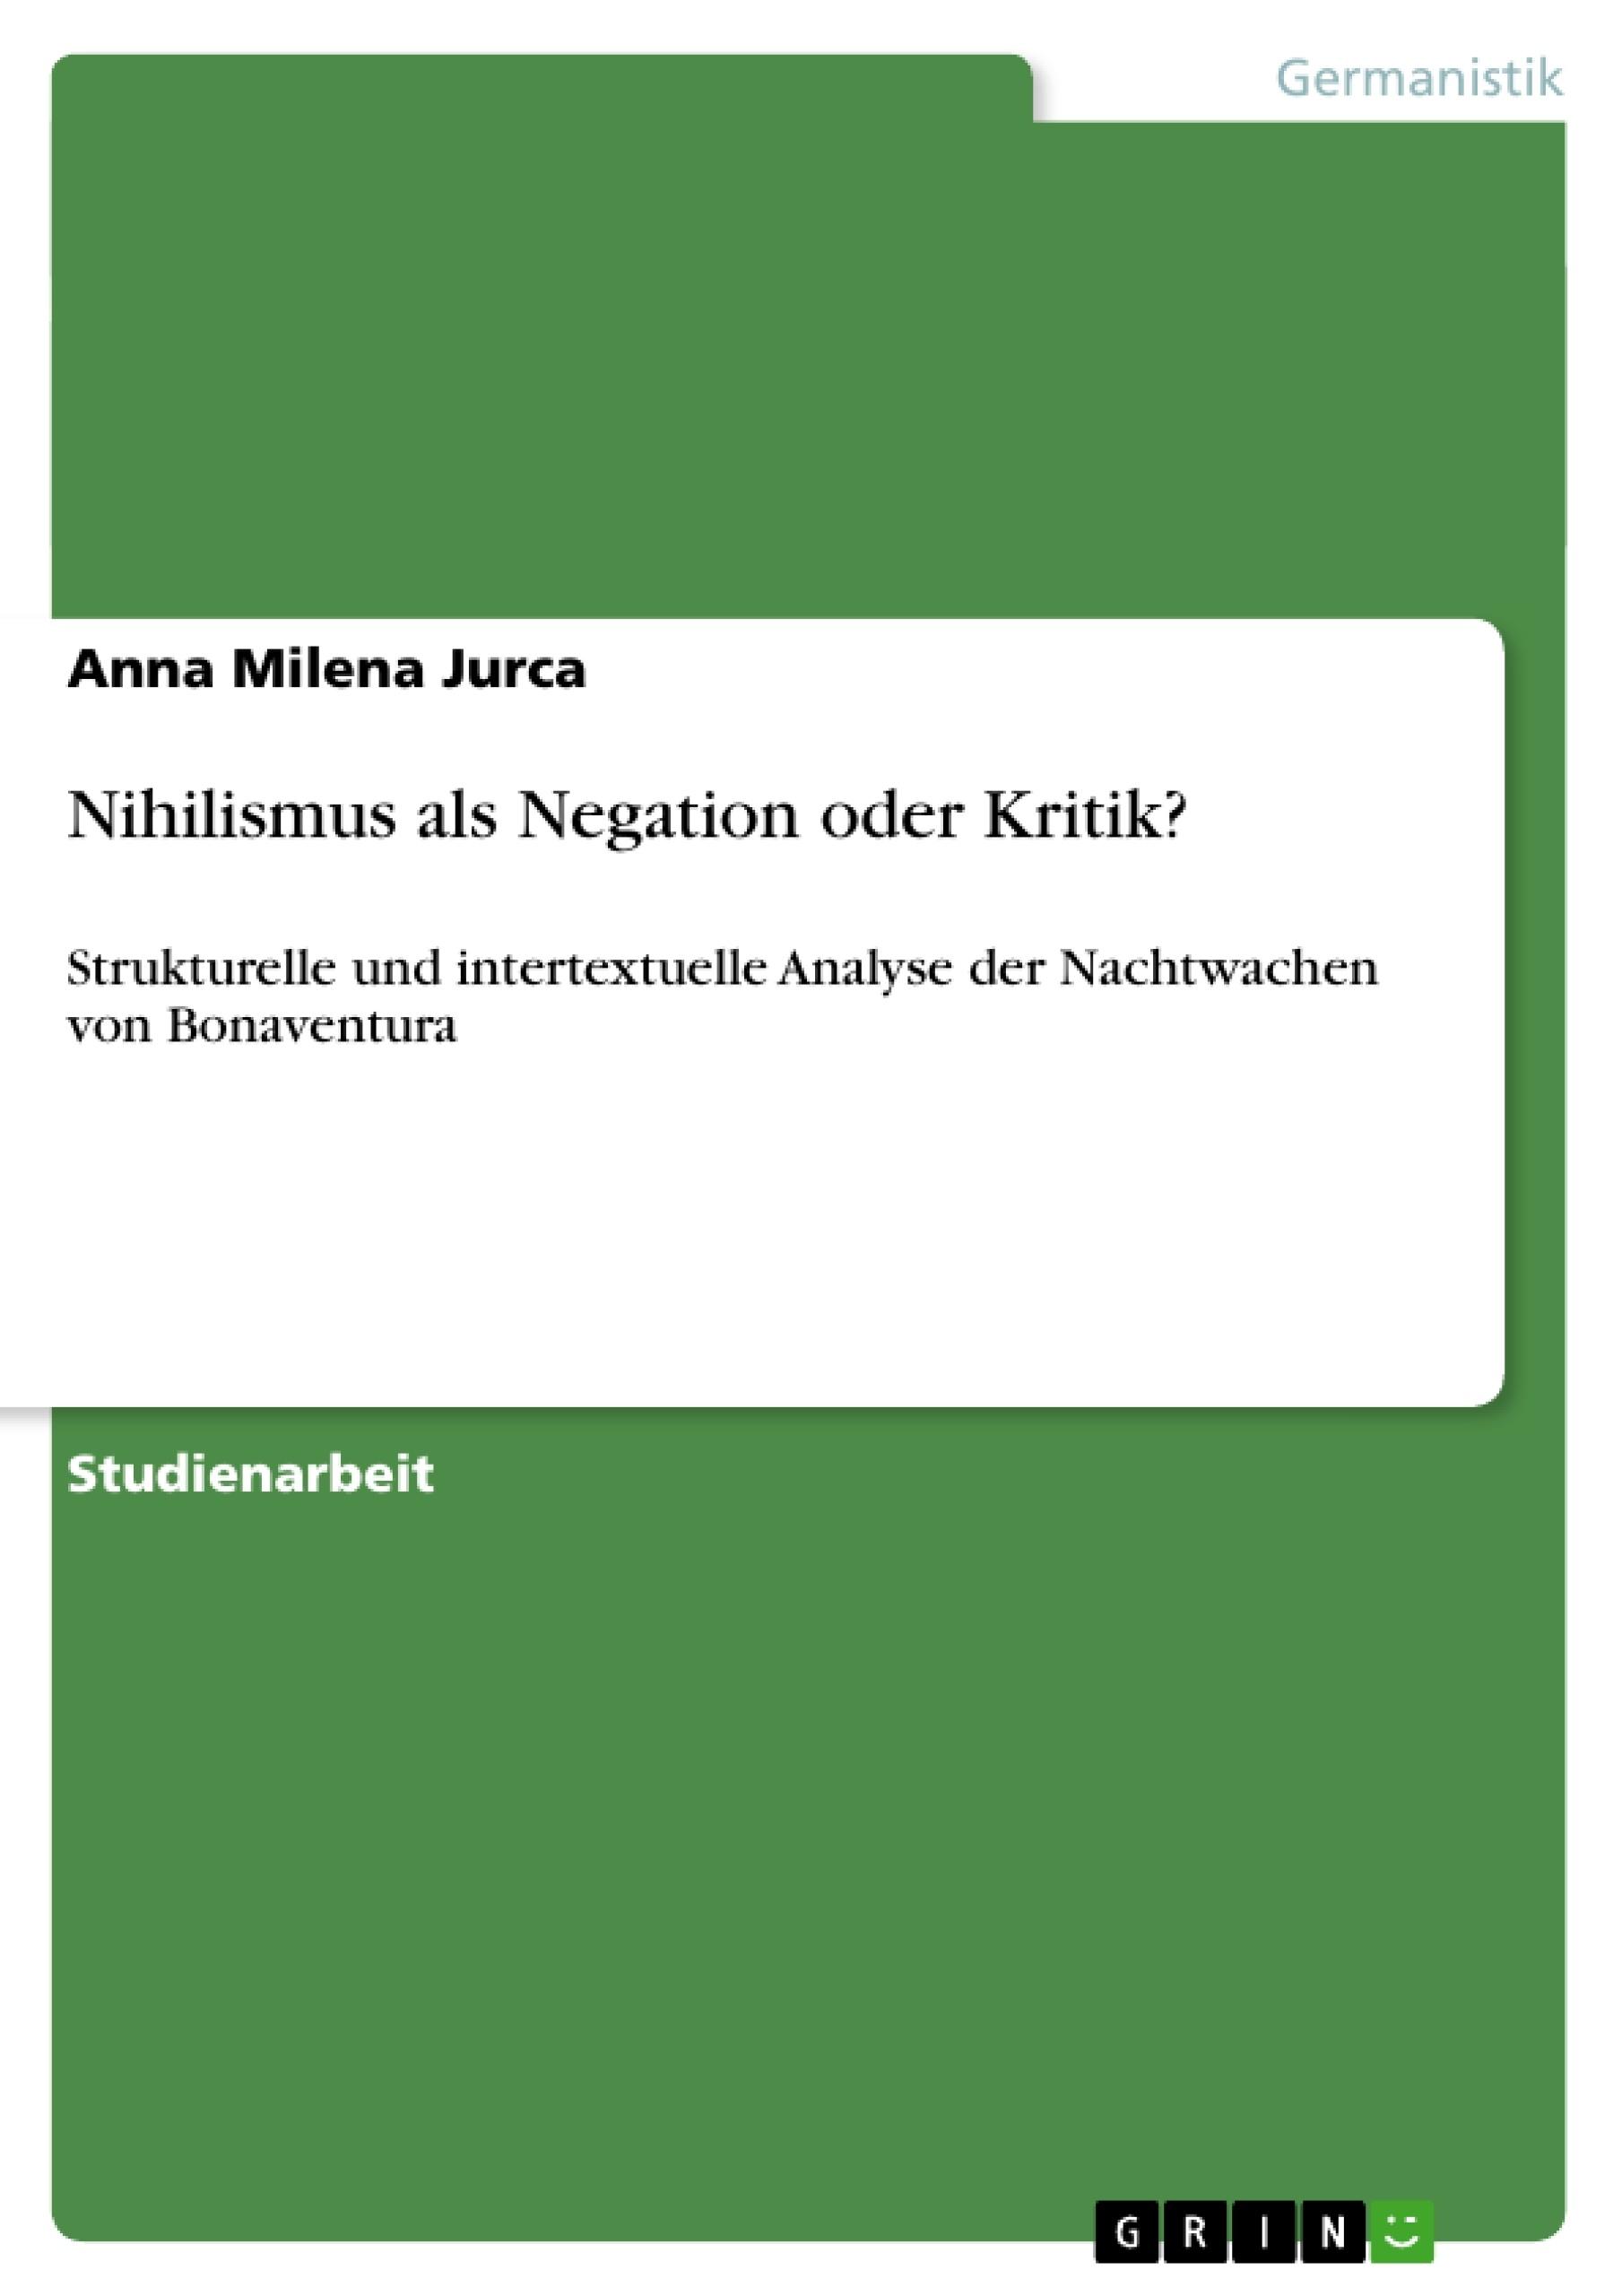 Titel: Nihilismus als Negation oder Kritik?